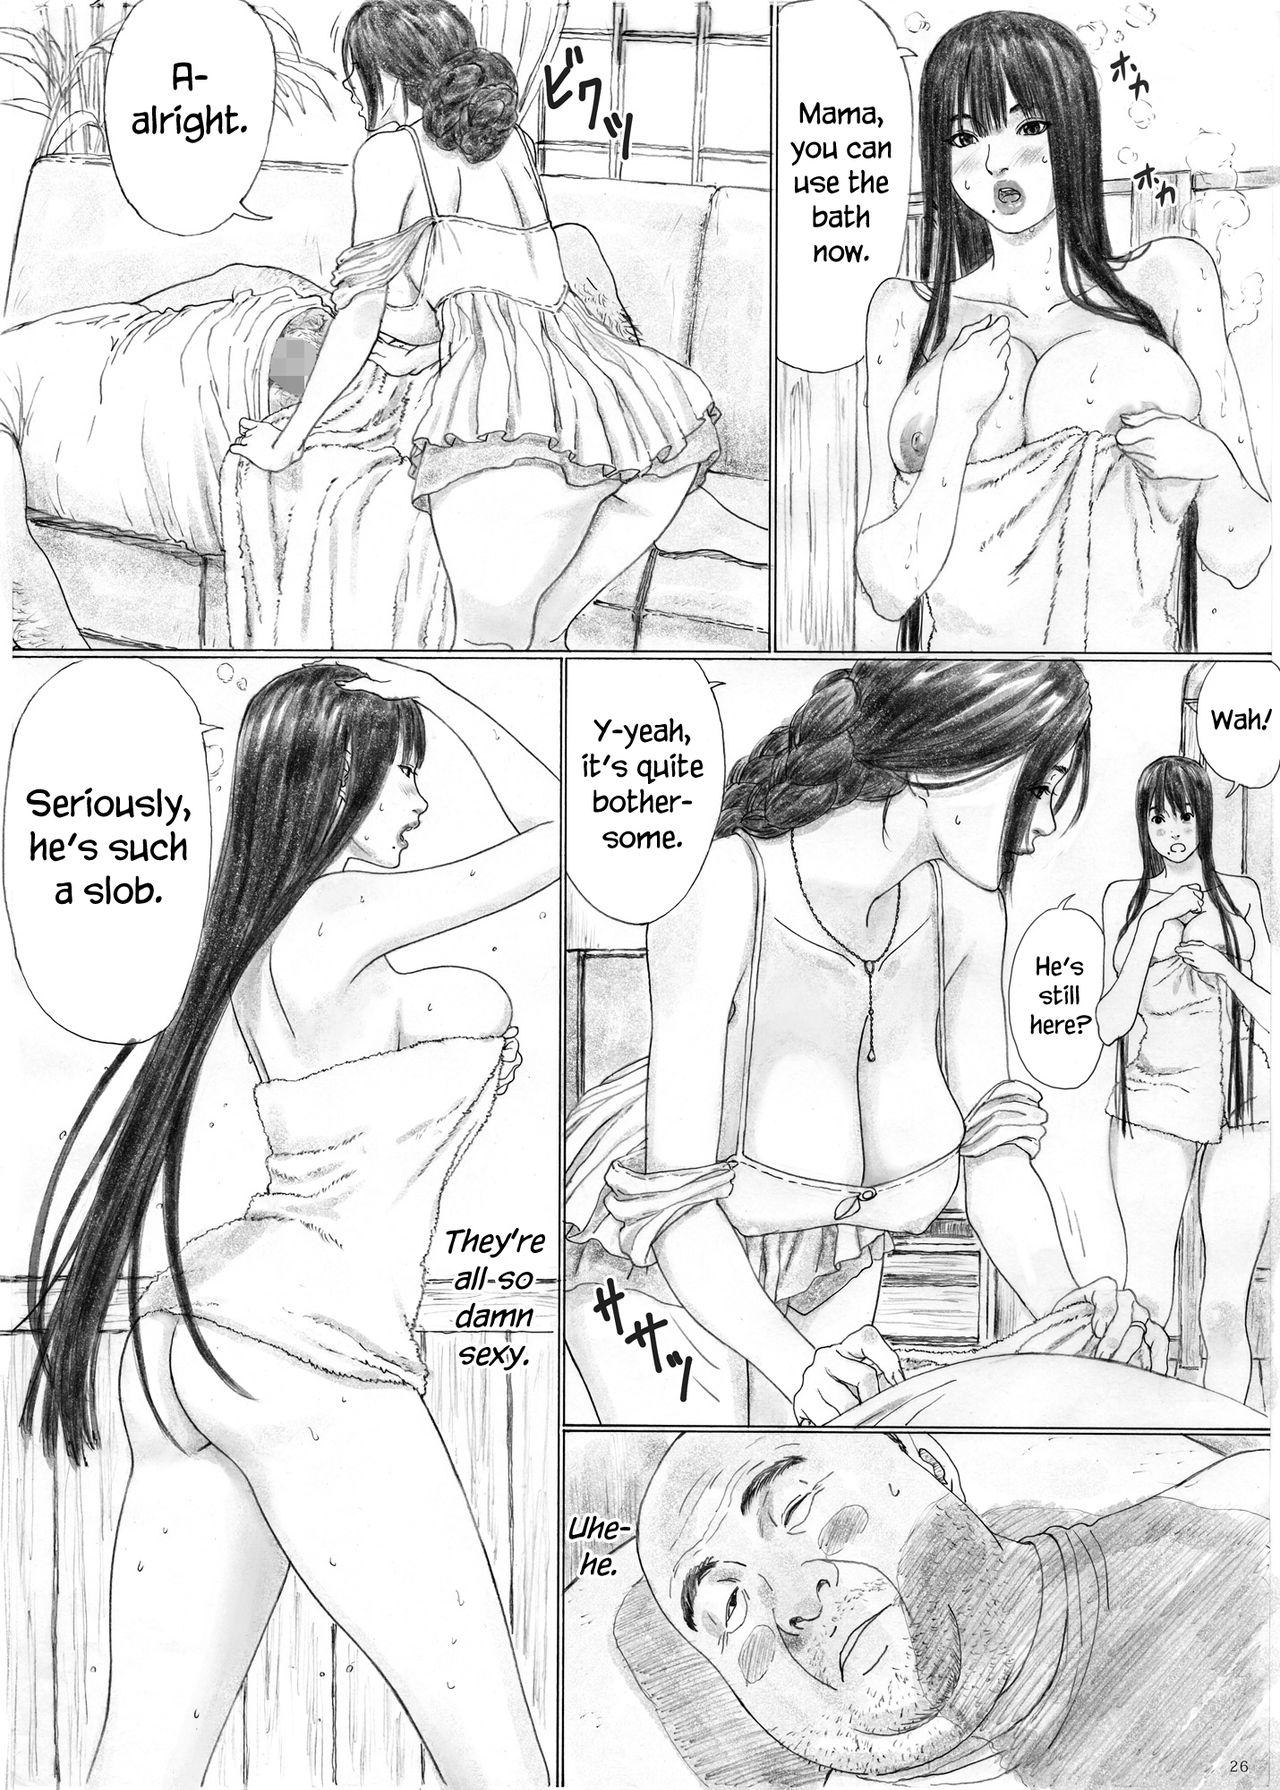 Inyoku no Sumika 1 | House of Lust 1 23